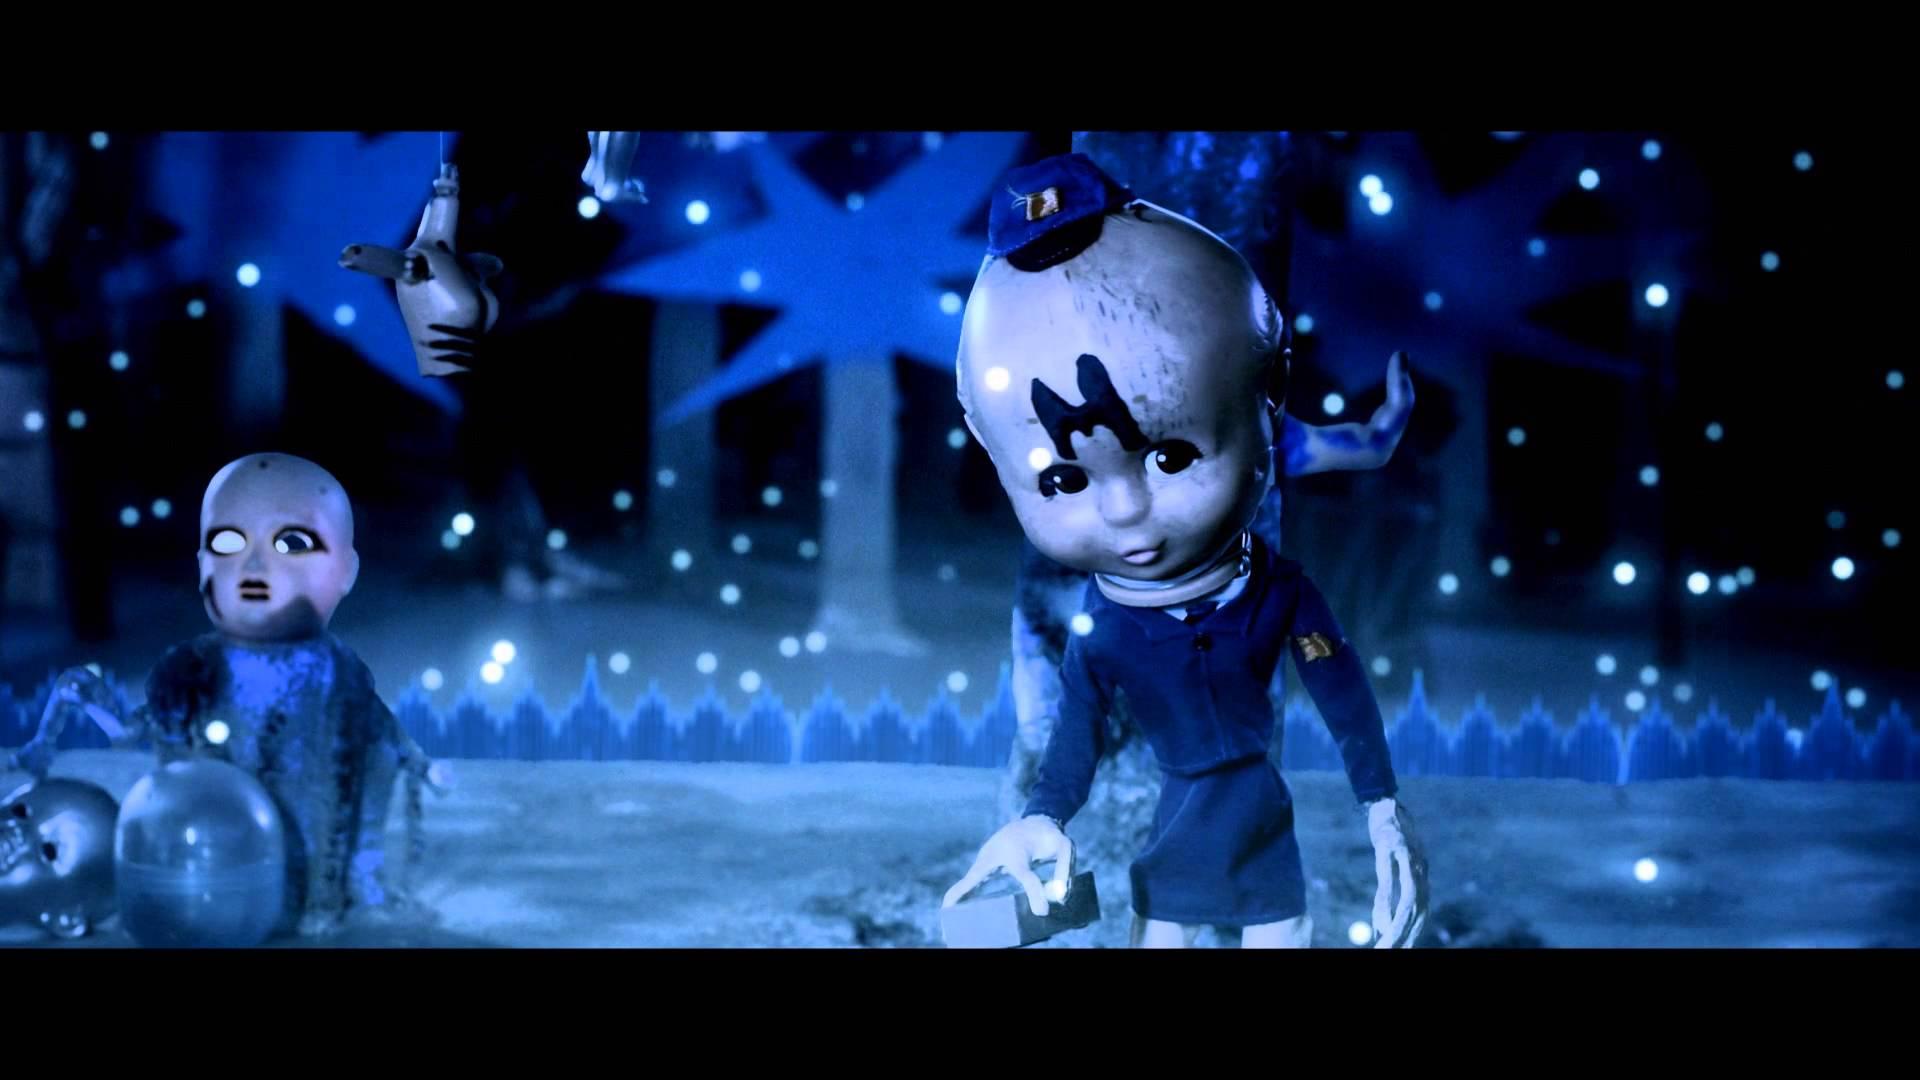 We Are The Strange (1080p)